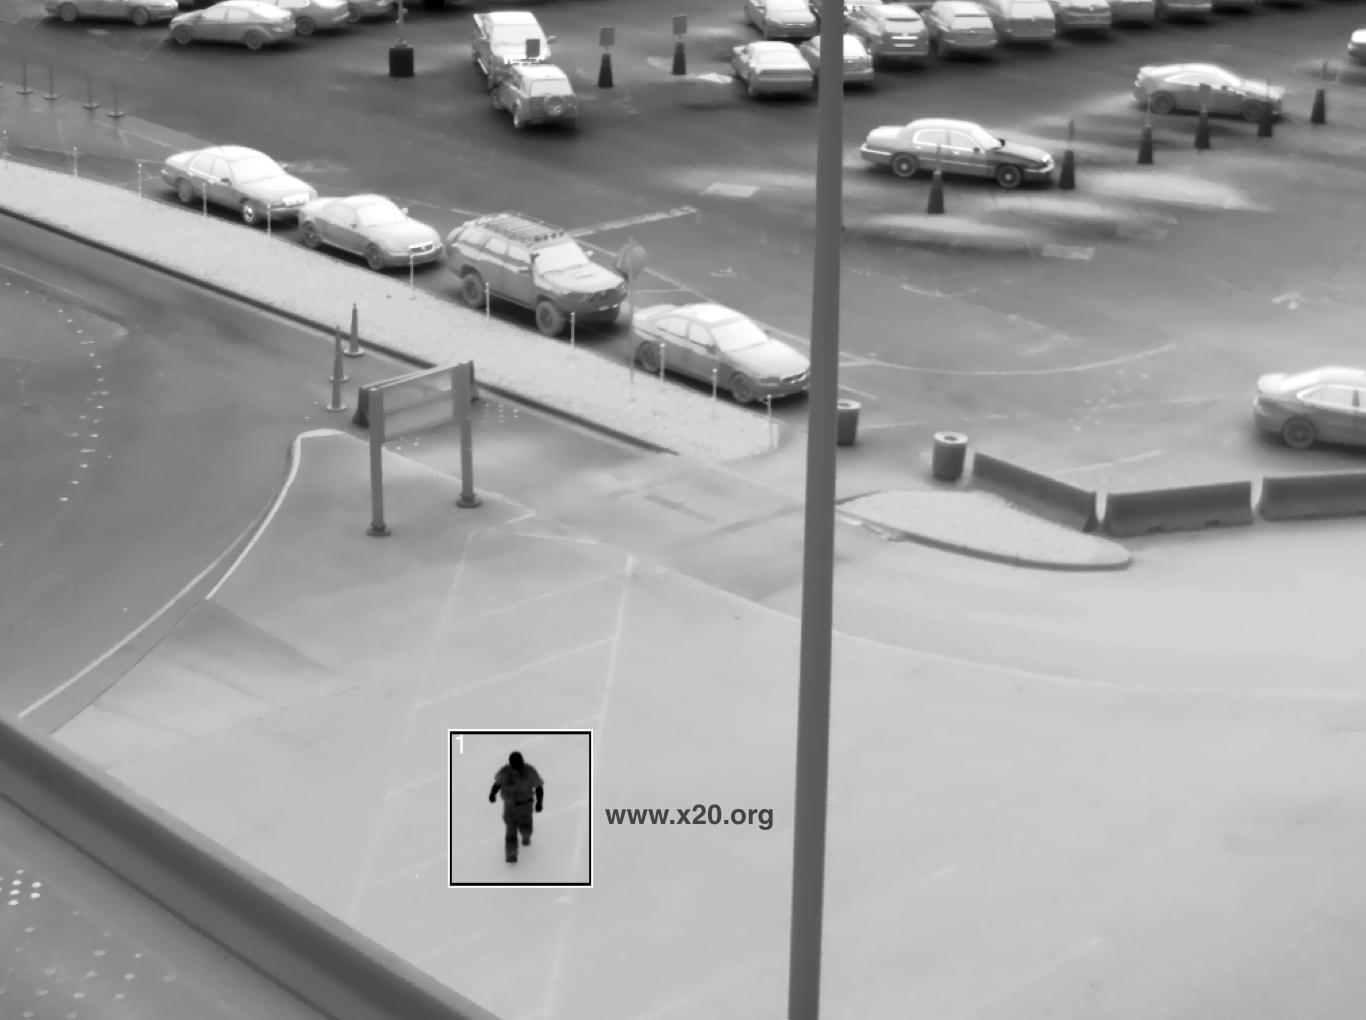 Lightweight long Range zoom cooled MWIR Thermal imaging FLIR IR camera core integration